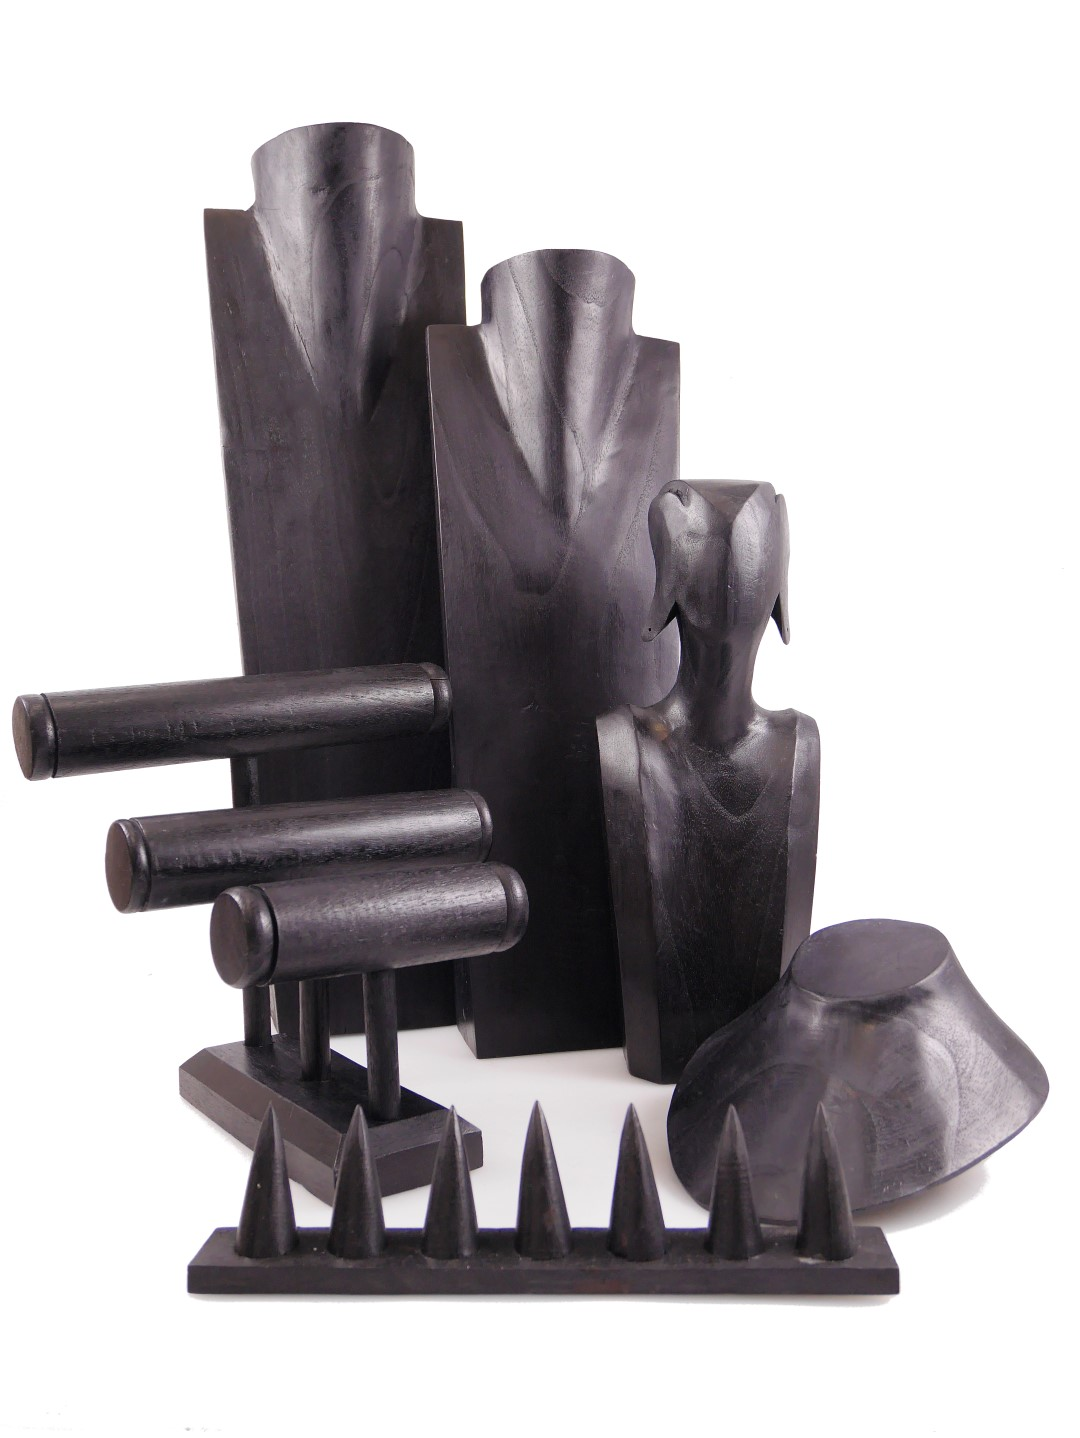 présentoir porte bijoux en bois noir artisanat coco papaya